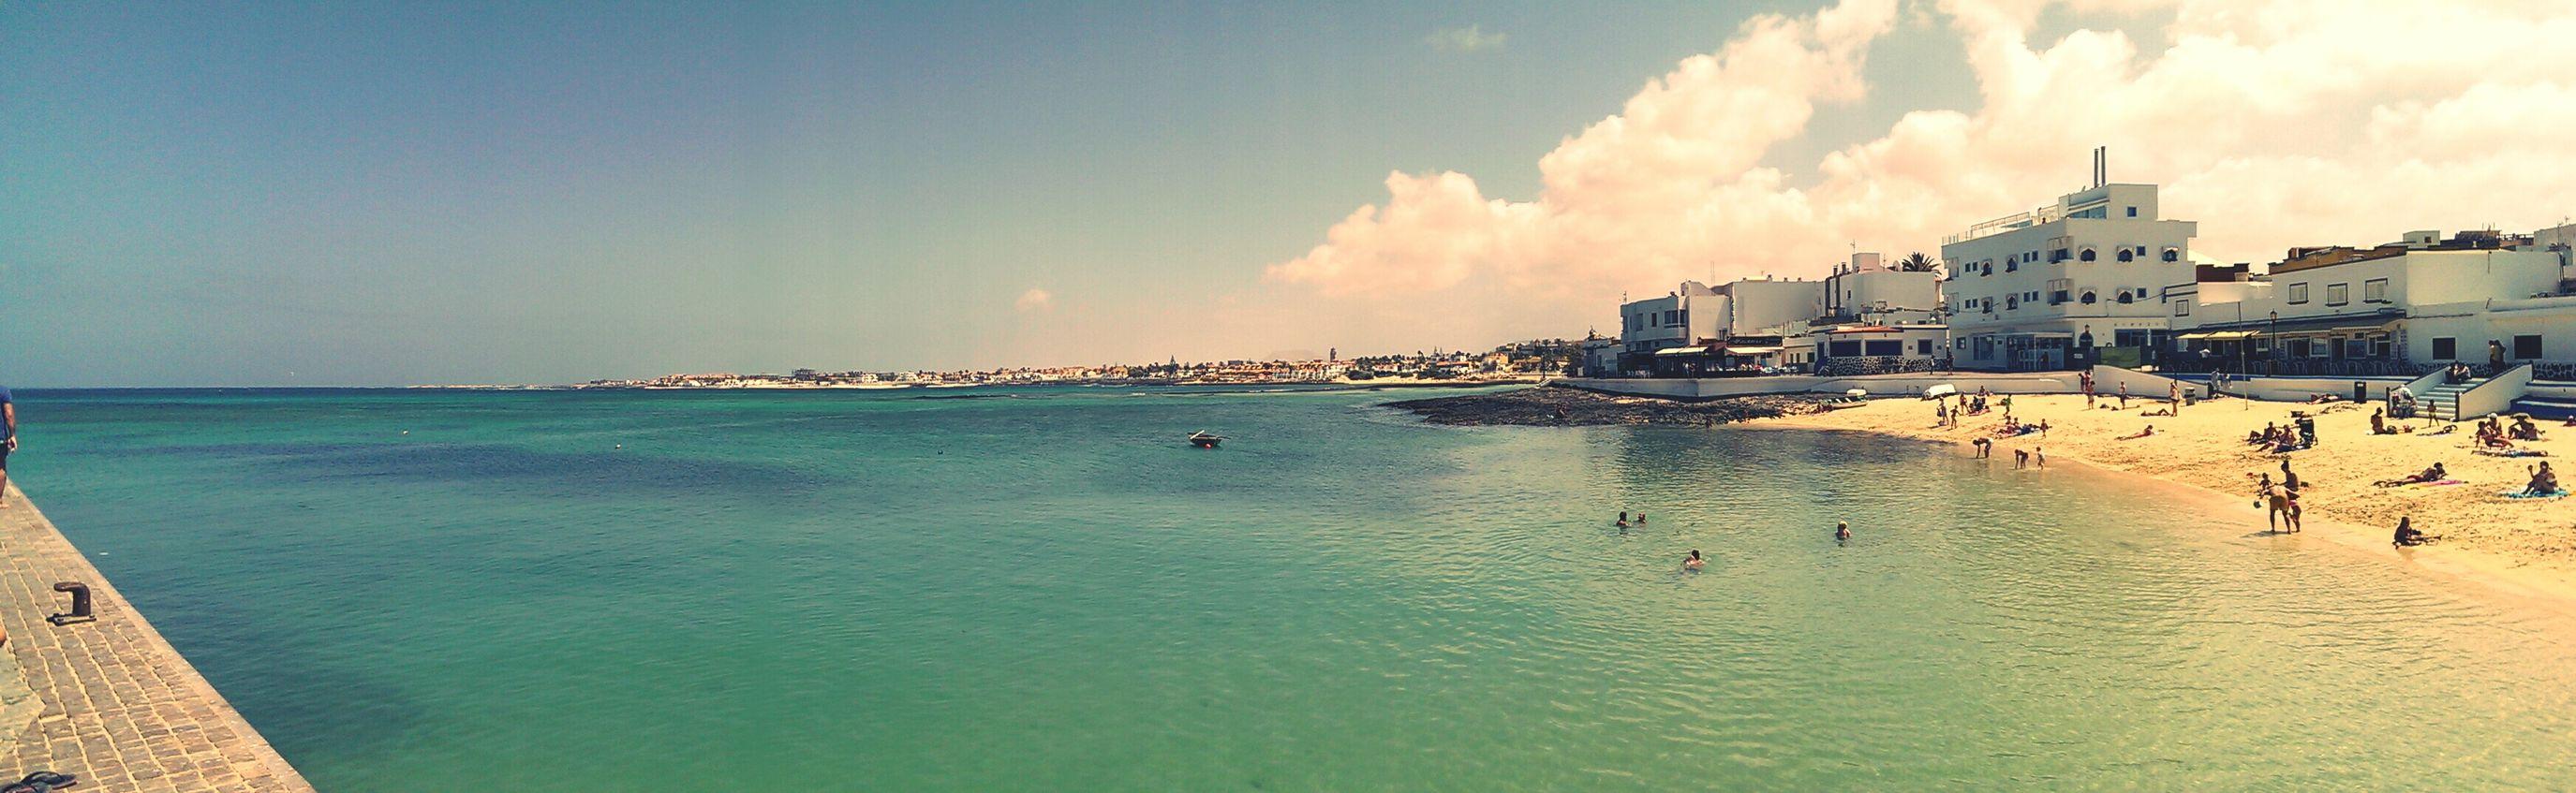 Playa Fuerteventura Sol Muybien First Eyeem Photo